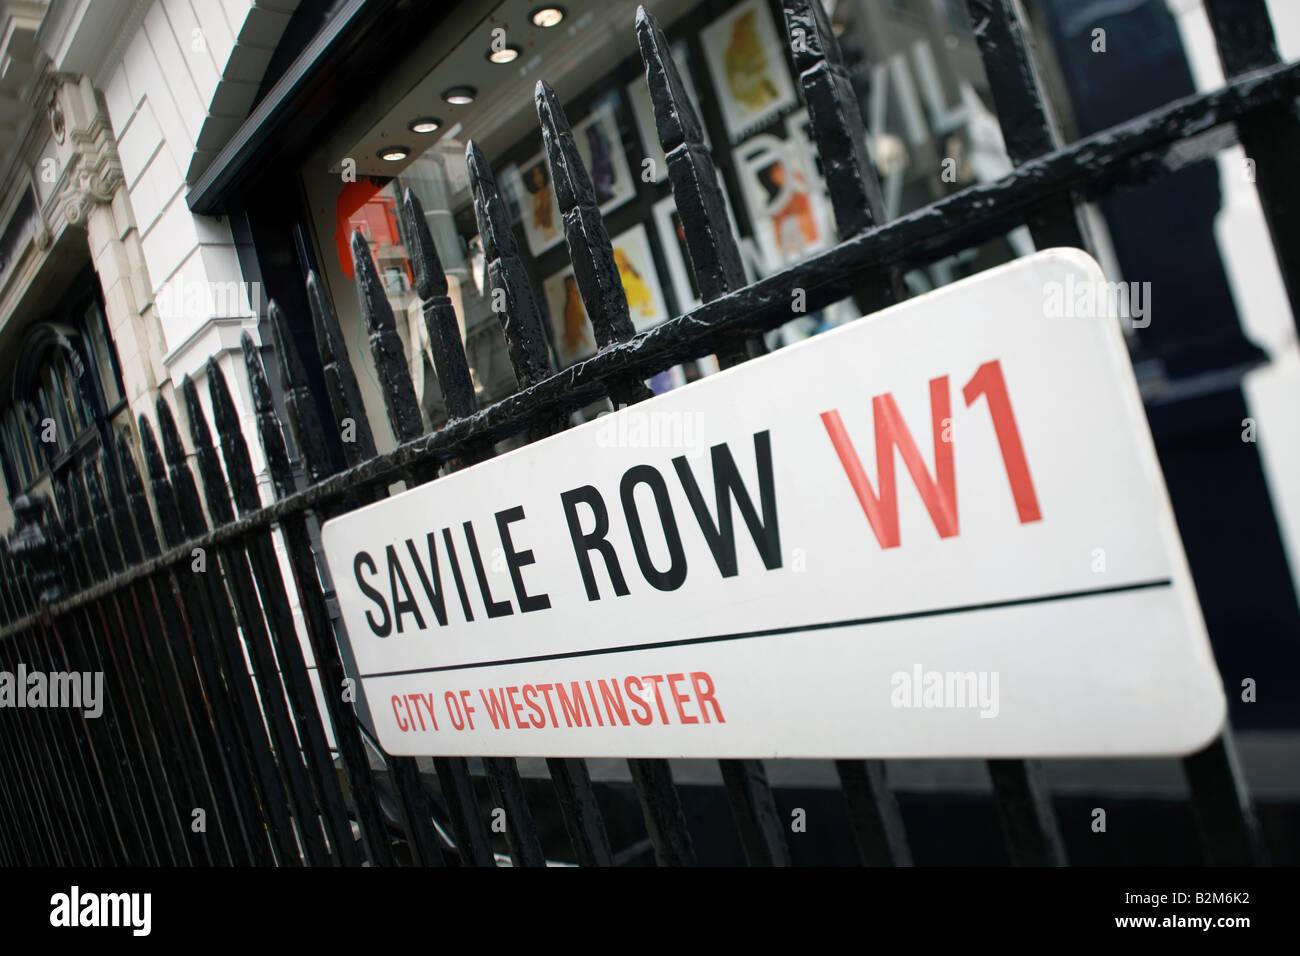 SAVILLE ROW STREET SIGN MAYFAIR LONDON ENGLAND UK - Stock Image